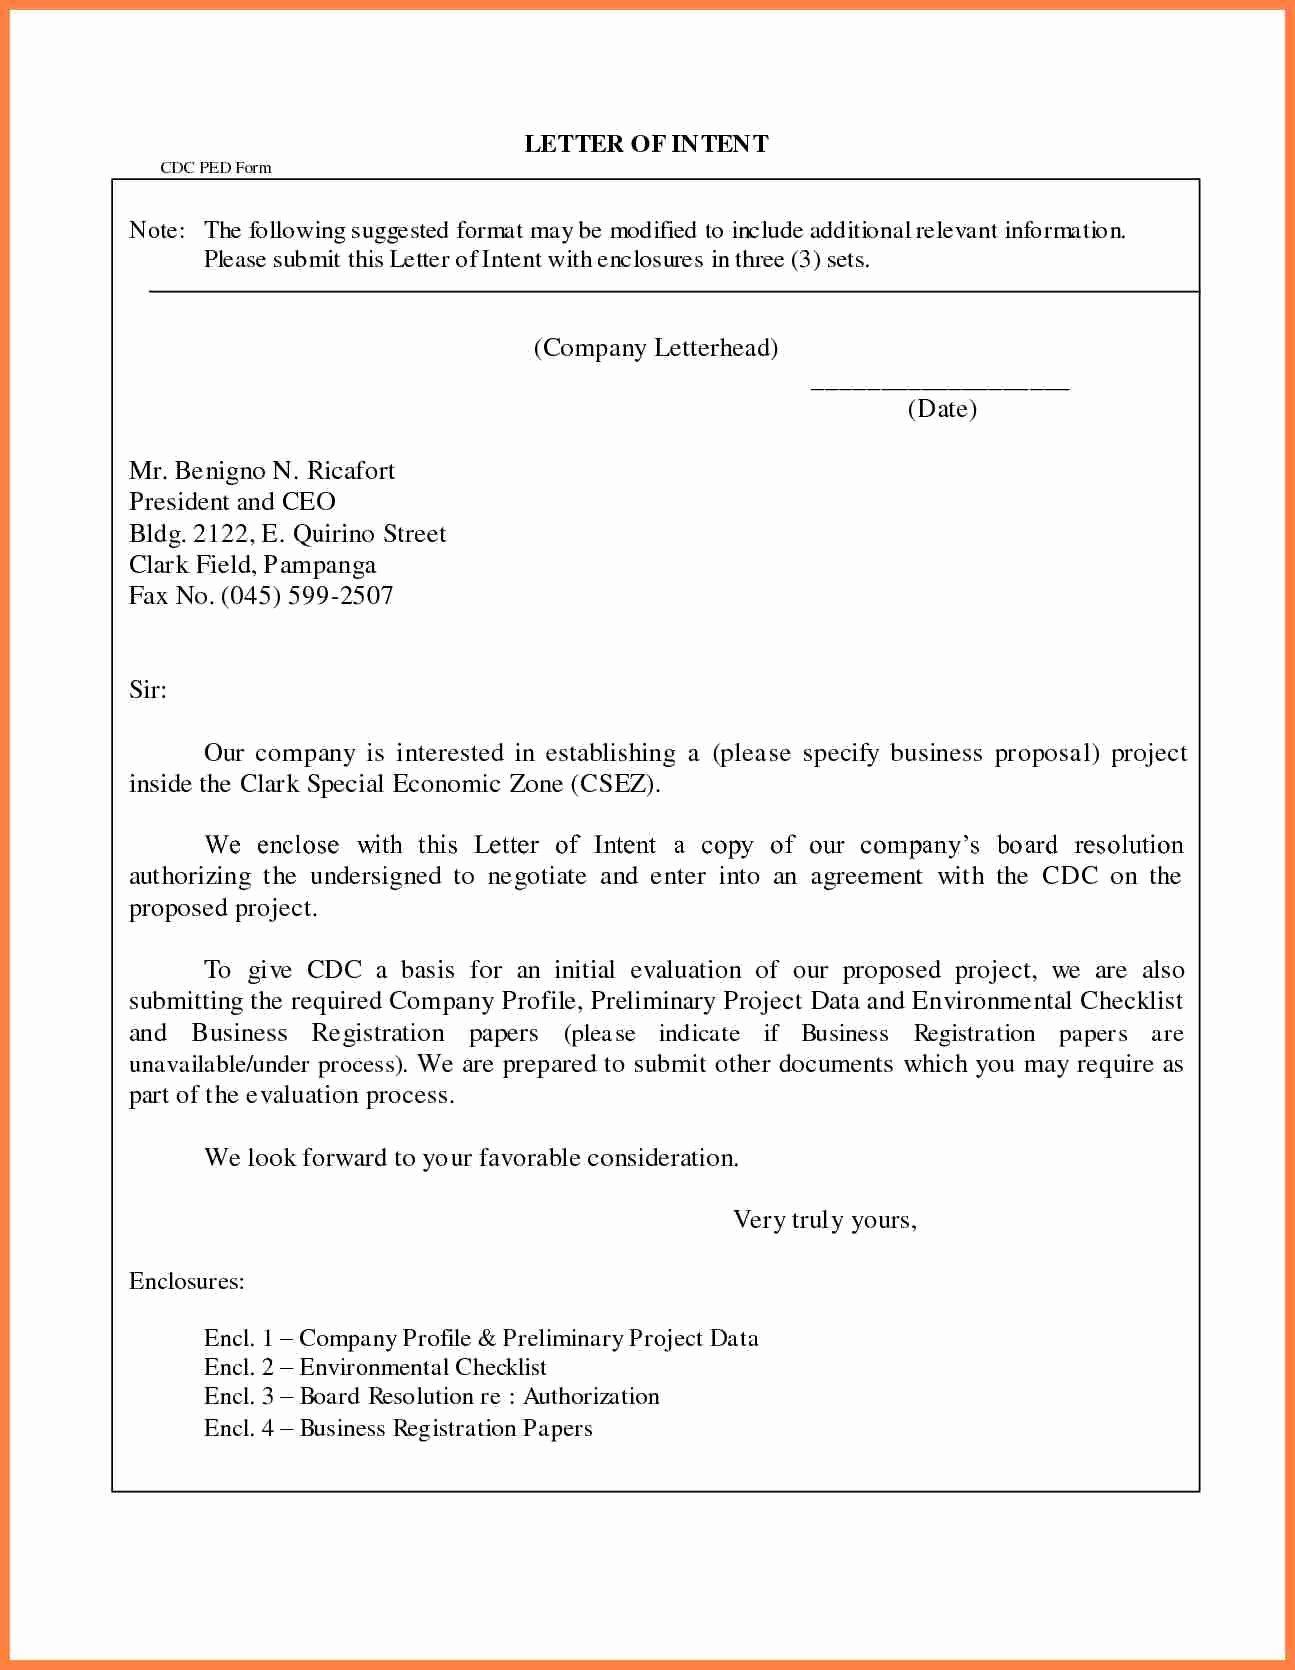 Business Letter Enclosure format Best Of 4 Pany Profile Sample Letter